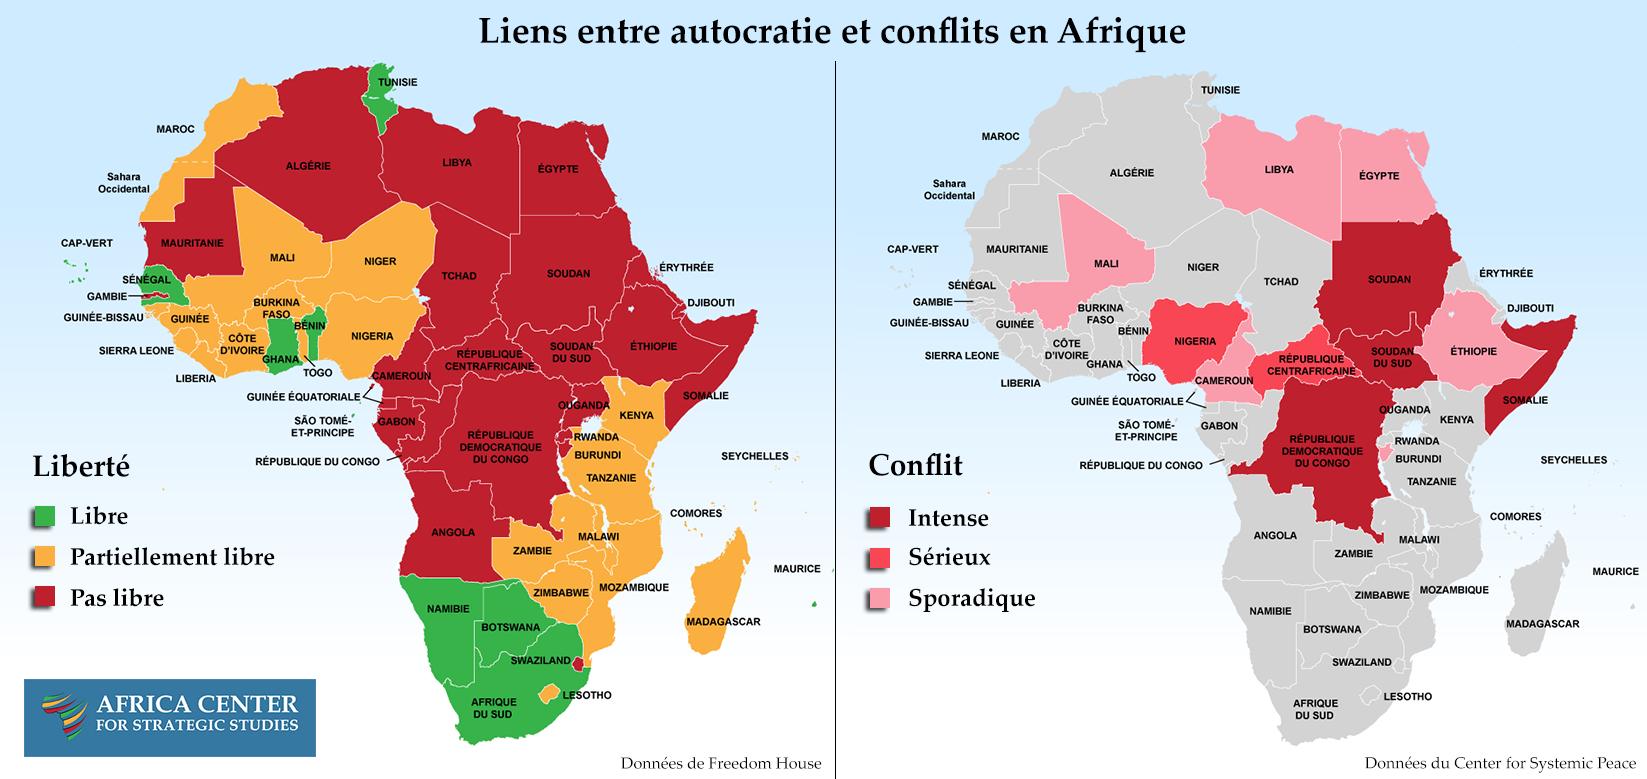 africa-map-liberte-et-conflit